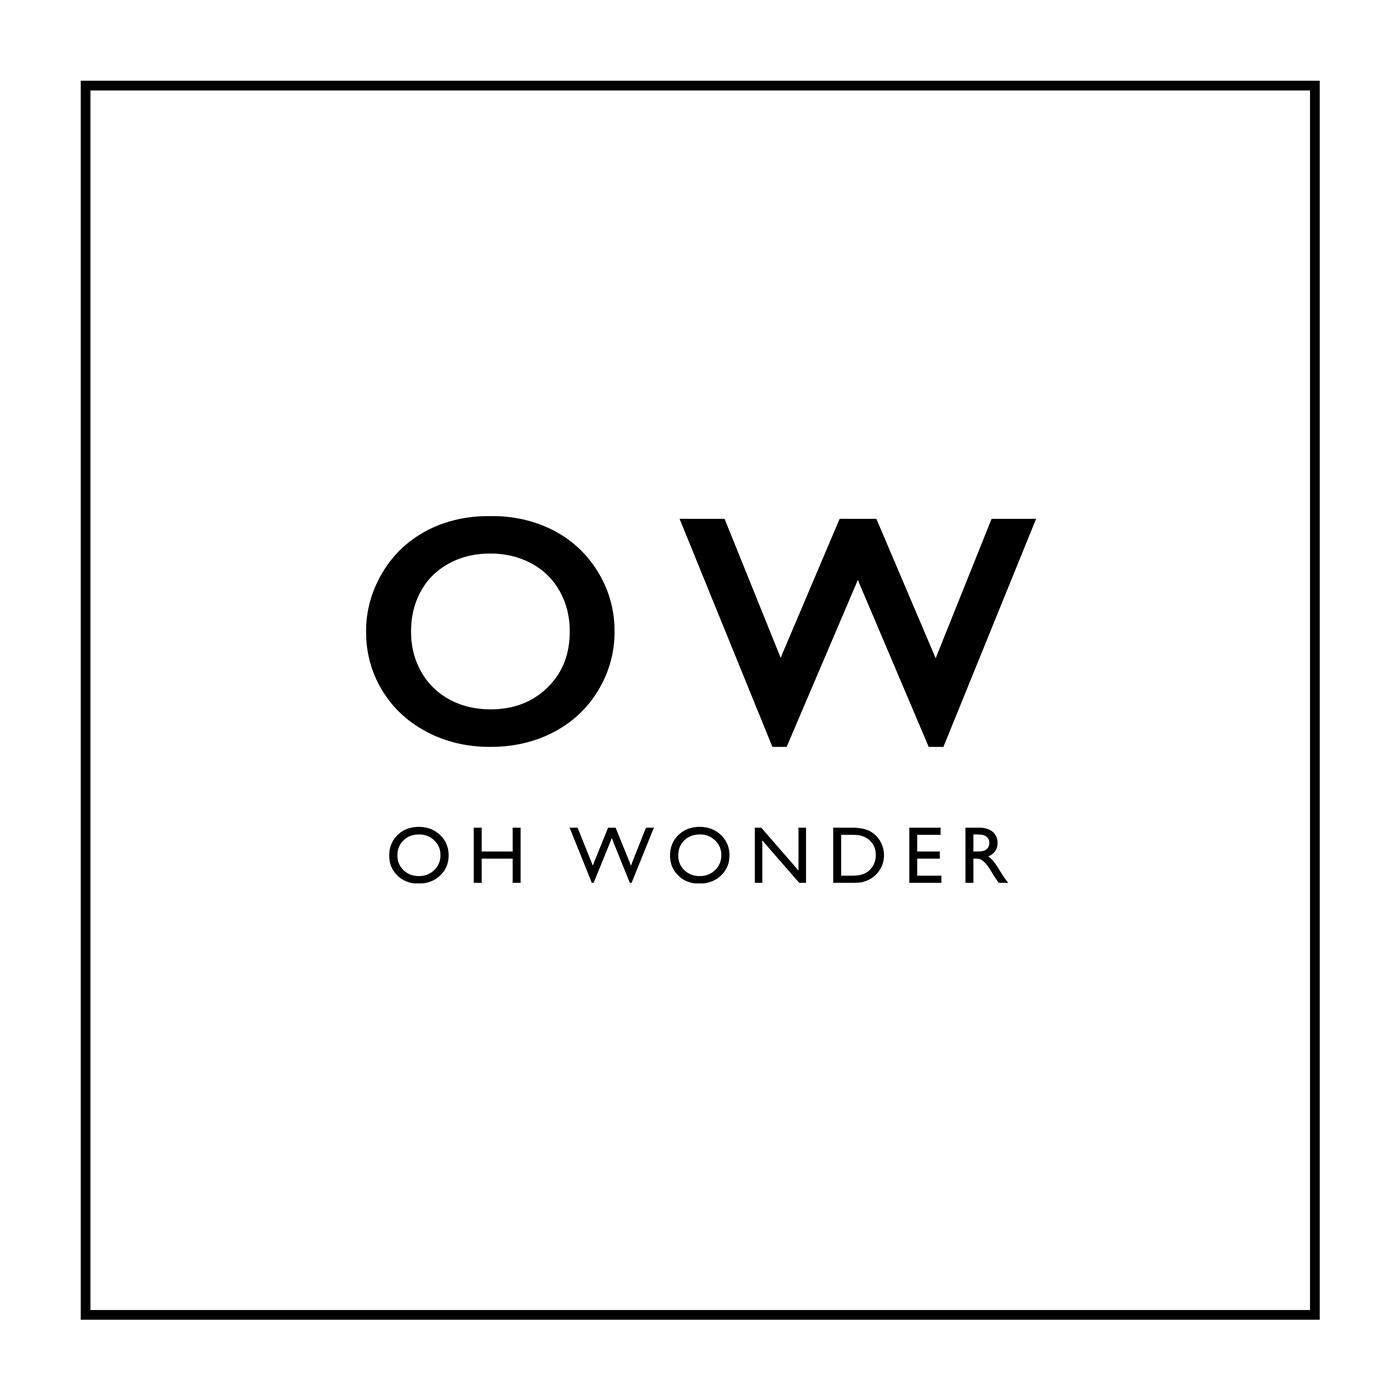 Oh Wonder - Oh Wonder